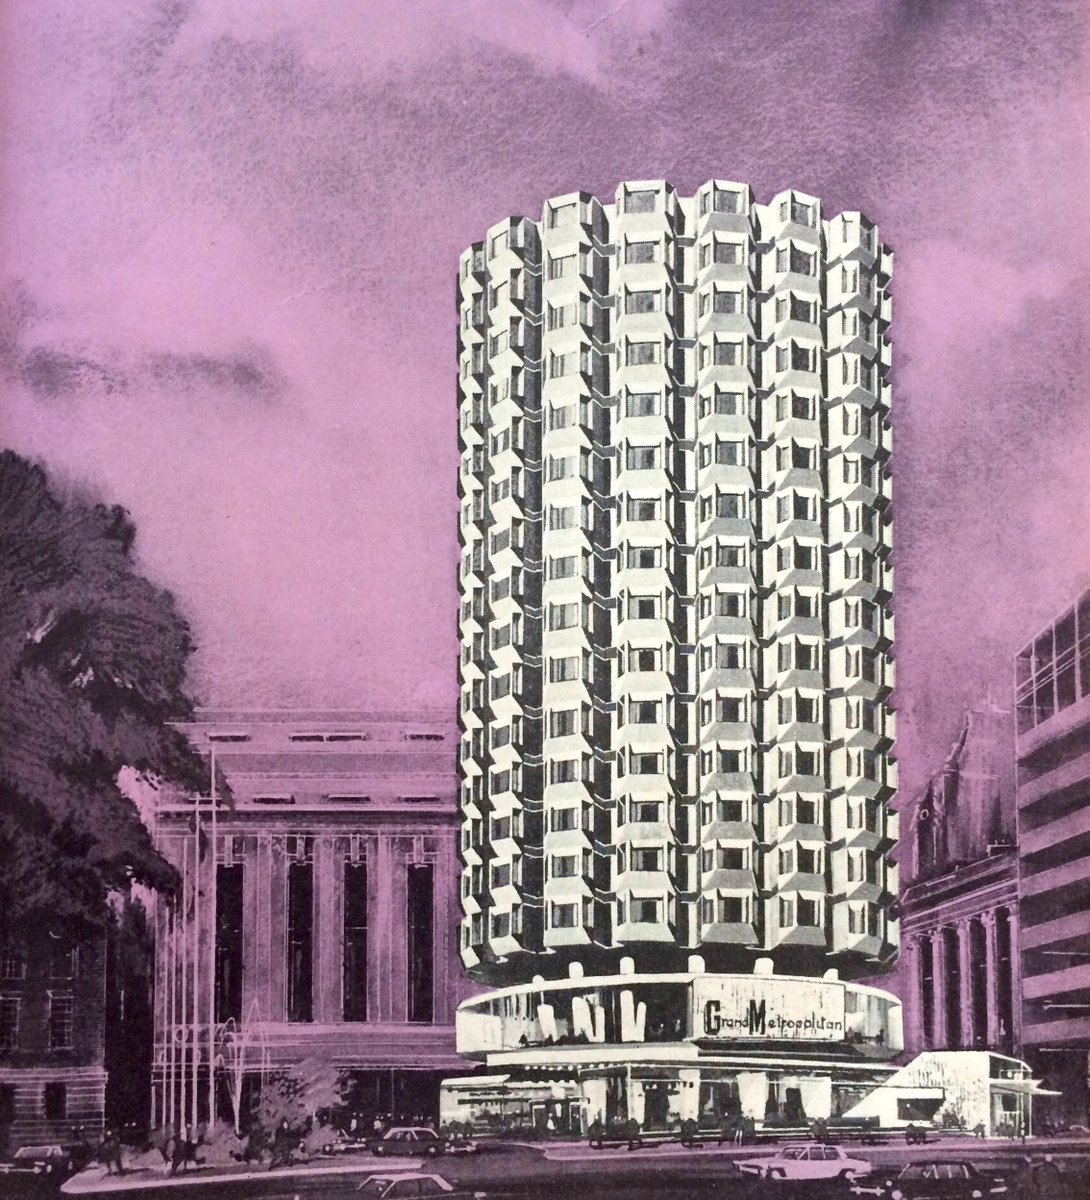 1970 perspectives for three Richard Seifert hotels.